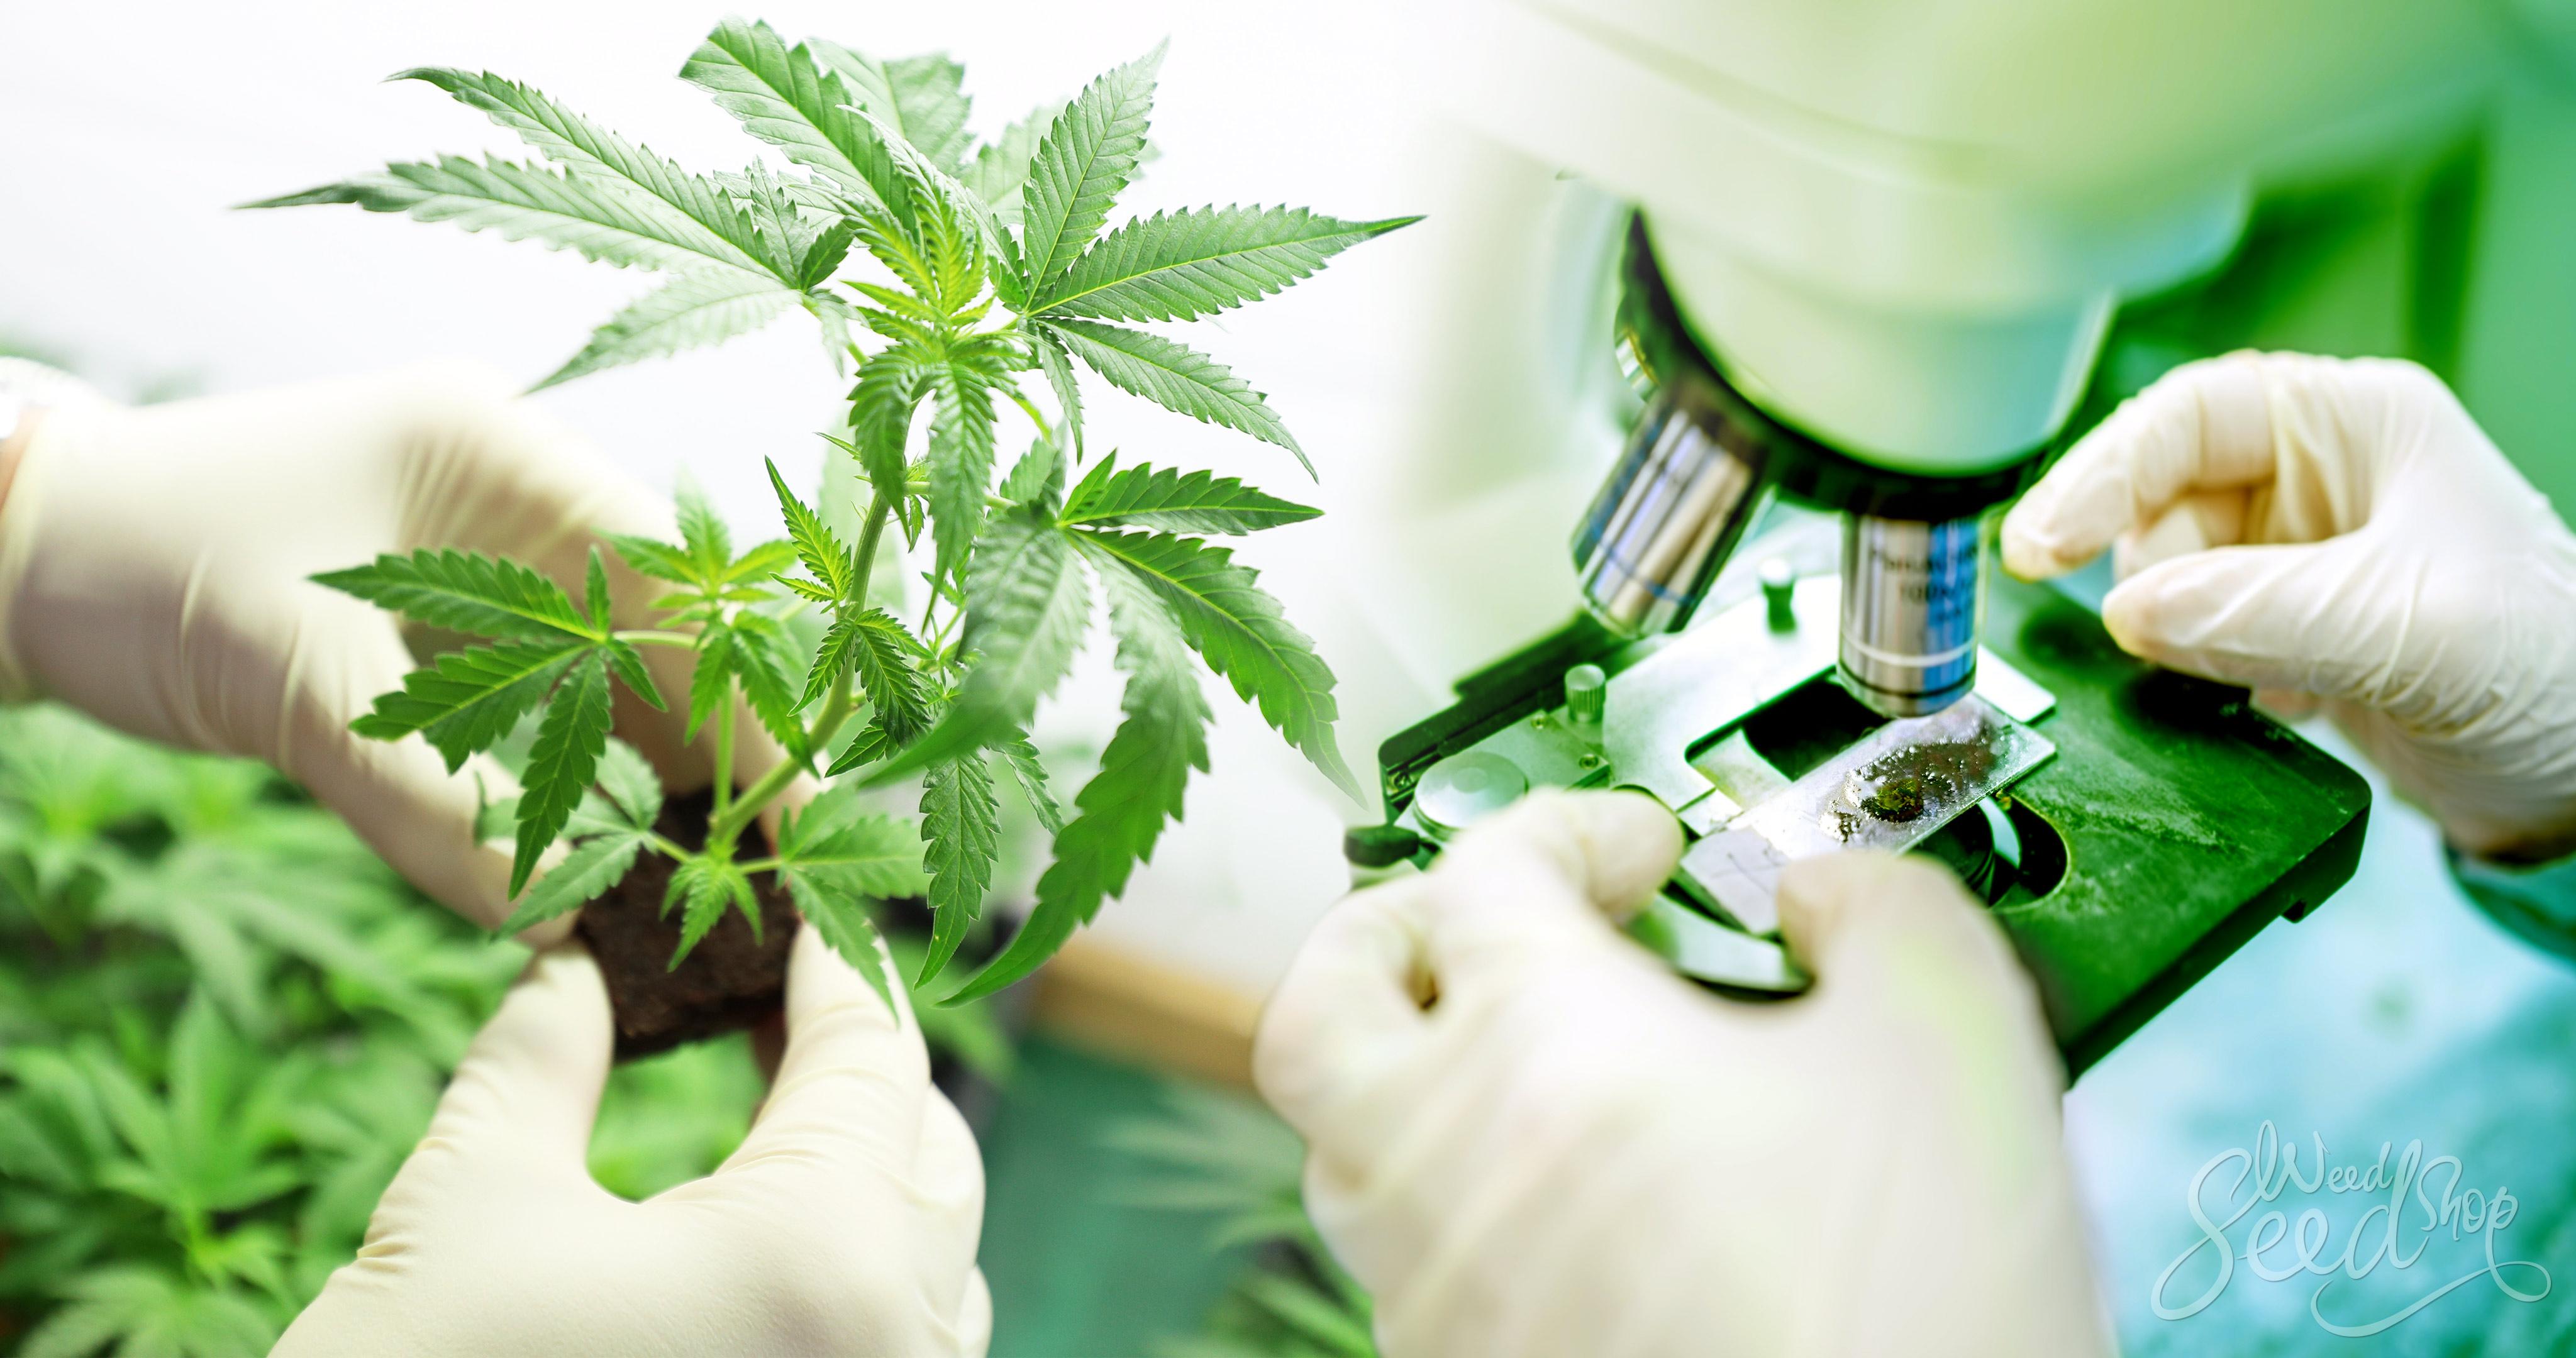 Cannabis Anatomie 101 - Delen van de plant - Weed Seed Shop Blog